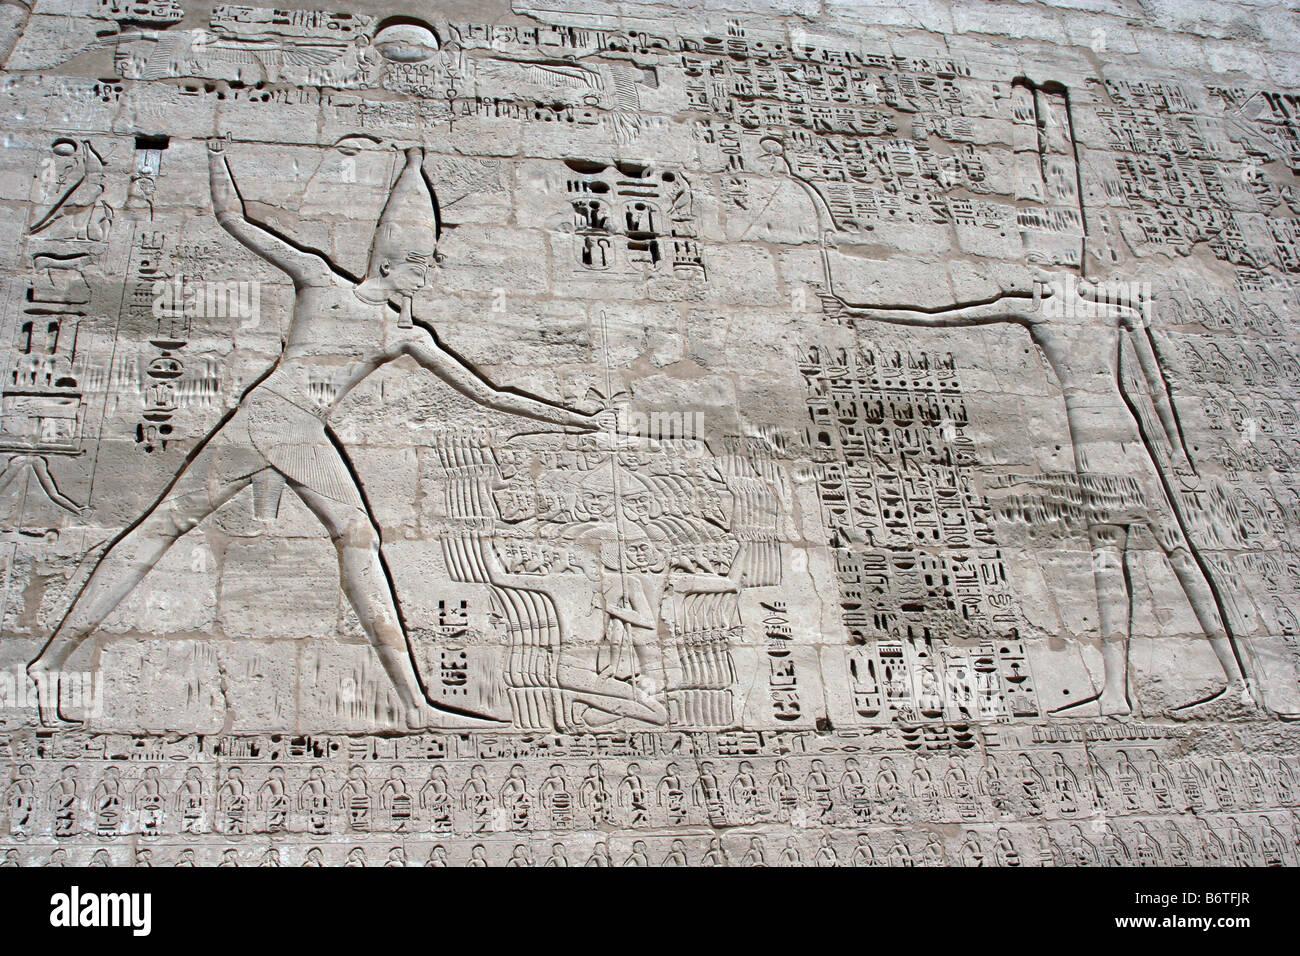 Relief of Rameses III smiting enemies, Mortuary Temple of Rameses III, Medinat Habu, Luxor, Egypt, c12th century - Stock Image